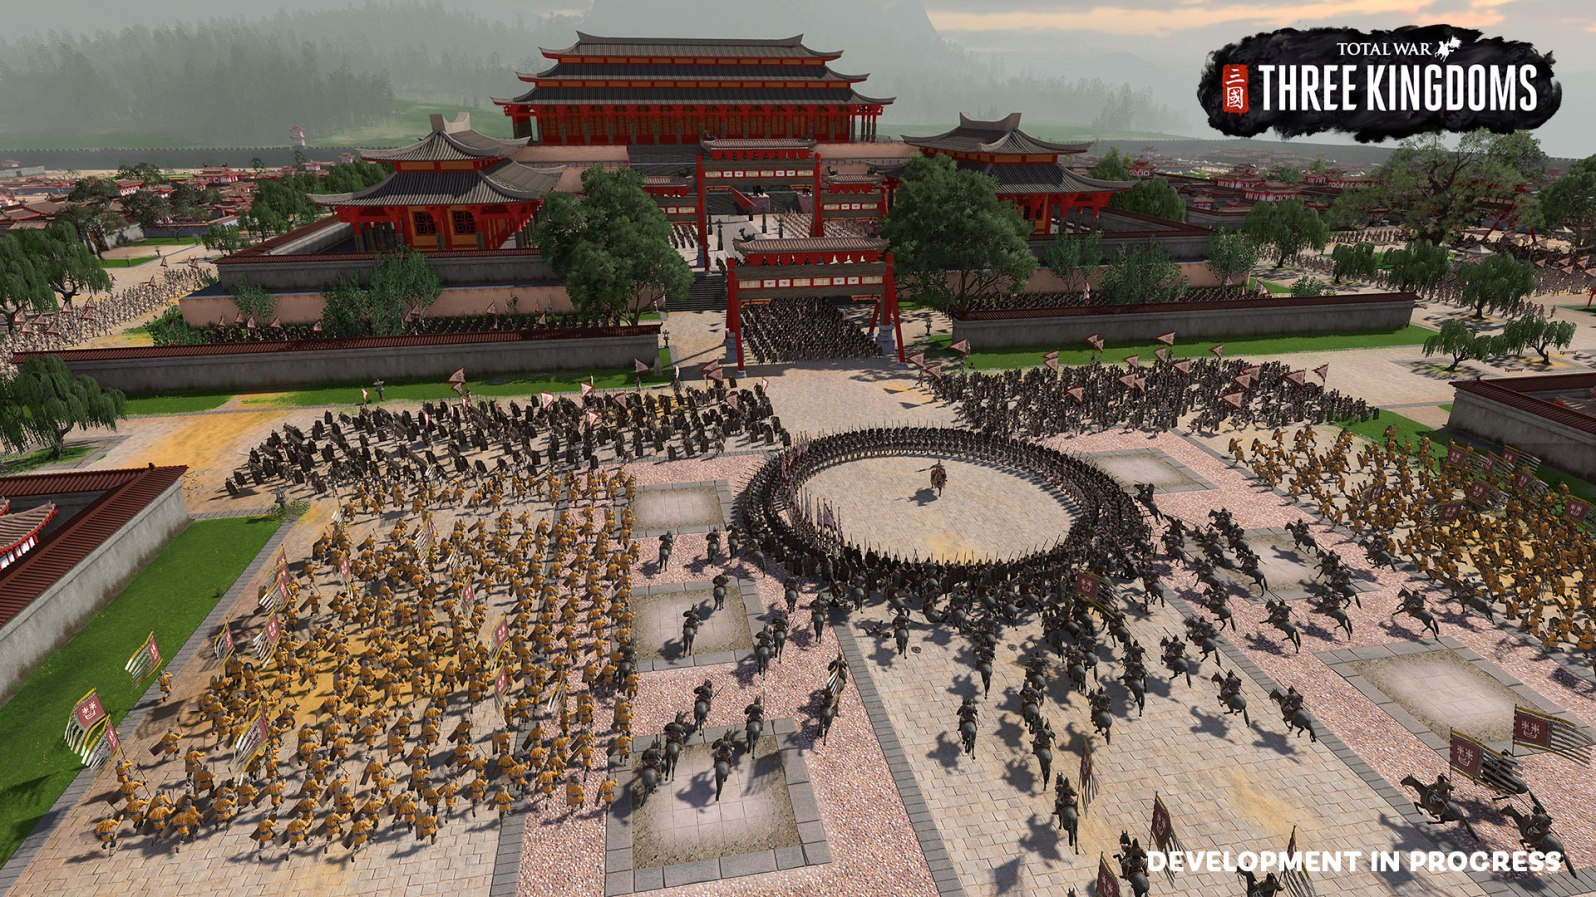 Quelle: totalwar.com - Total War: Three Kingdoms